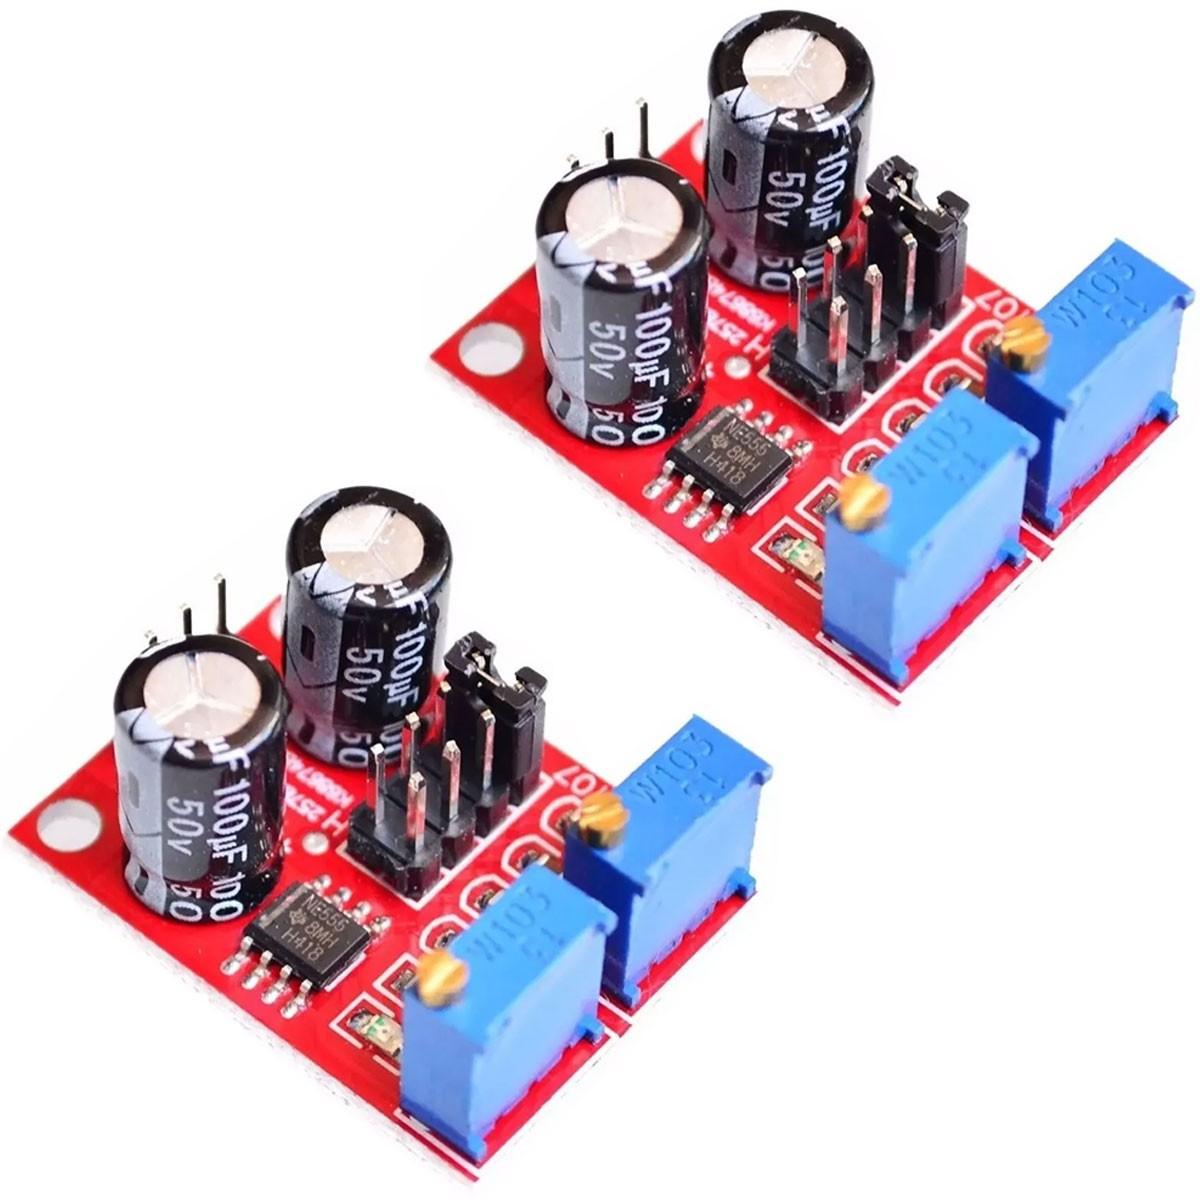 2x Modulo Ne555 Gerador Pulso Frequência PWM